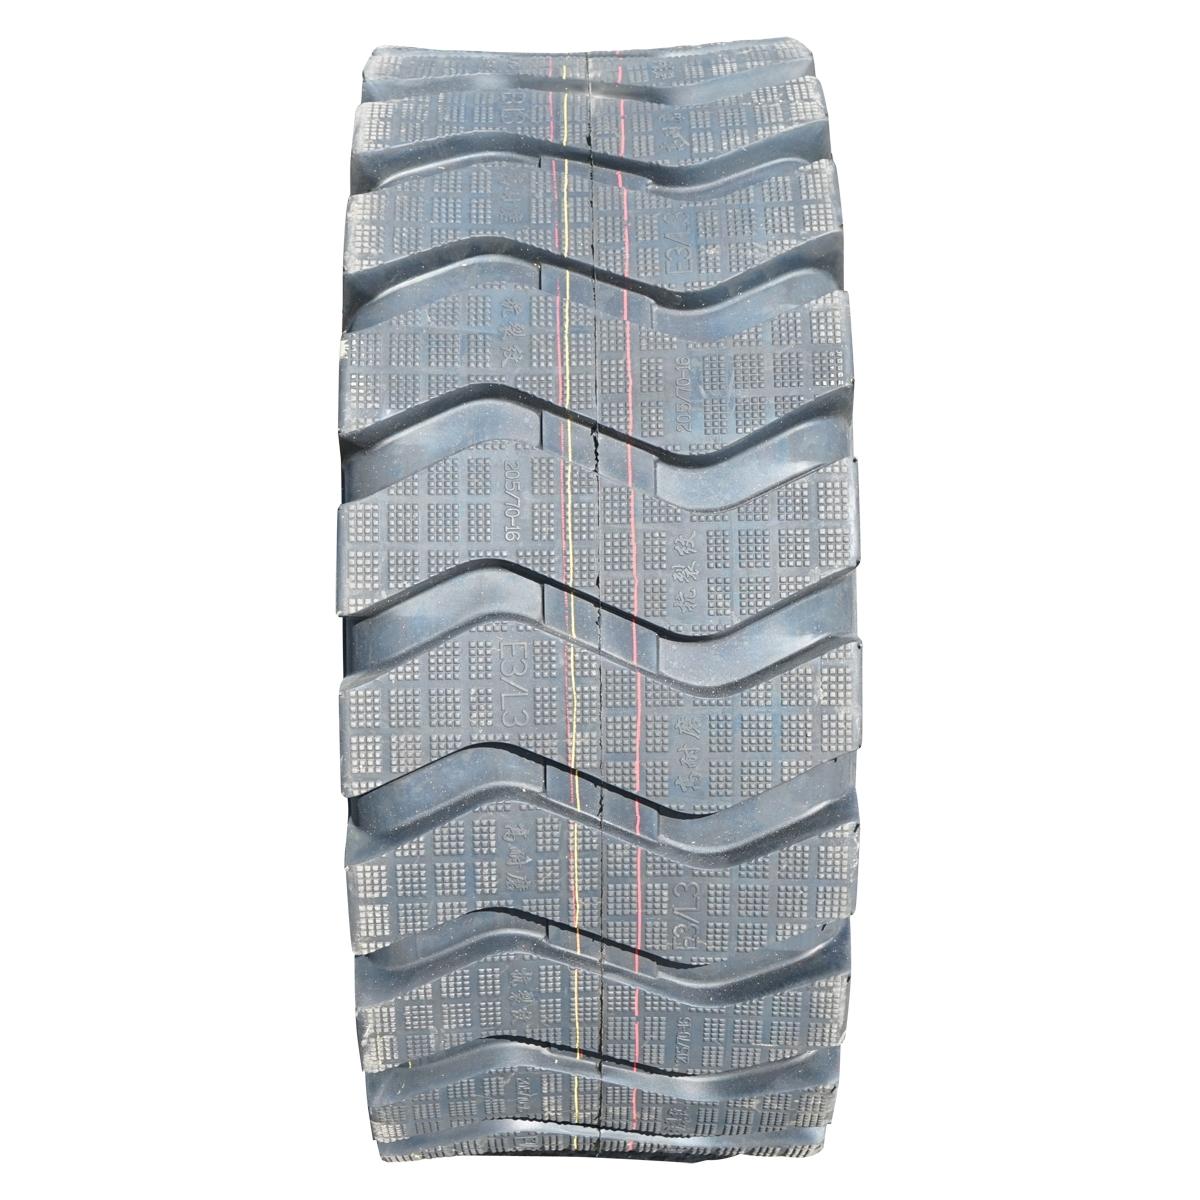 Anvelopa industriala 20.5/70-16 16PR